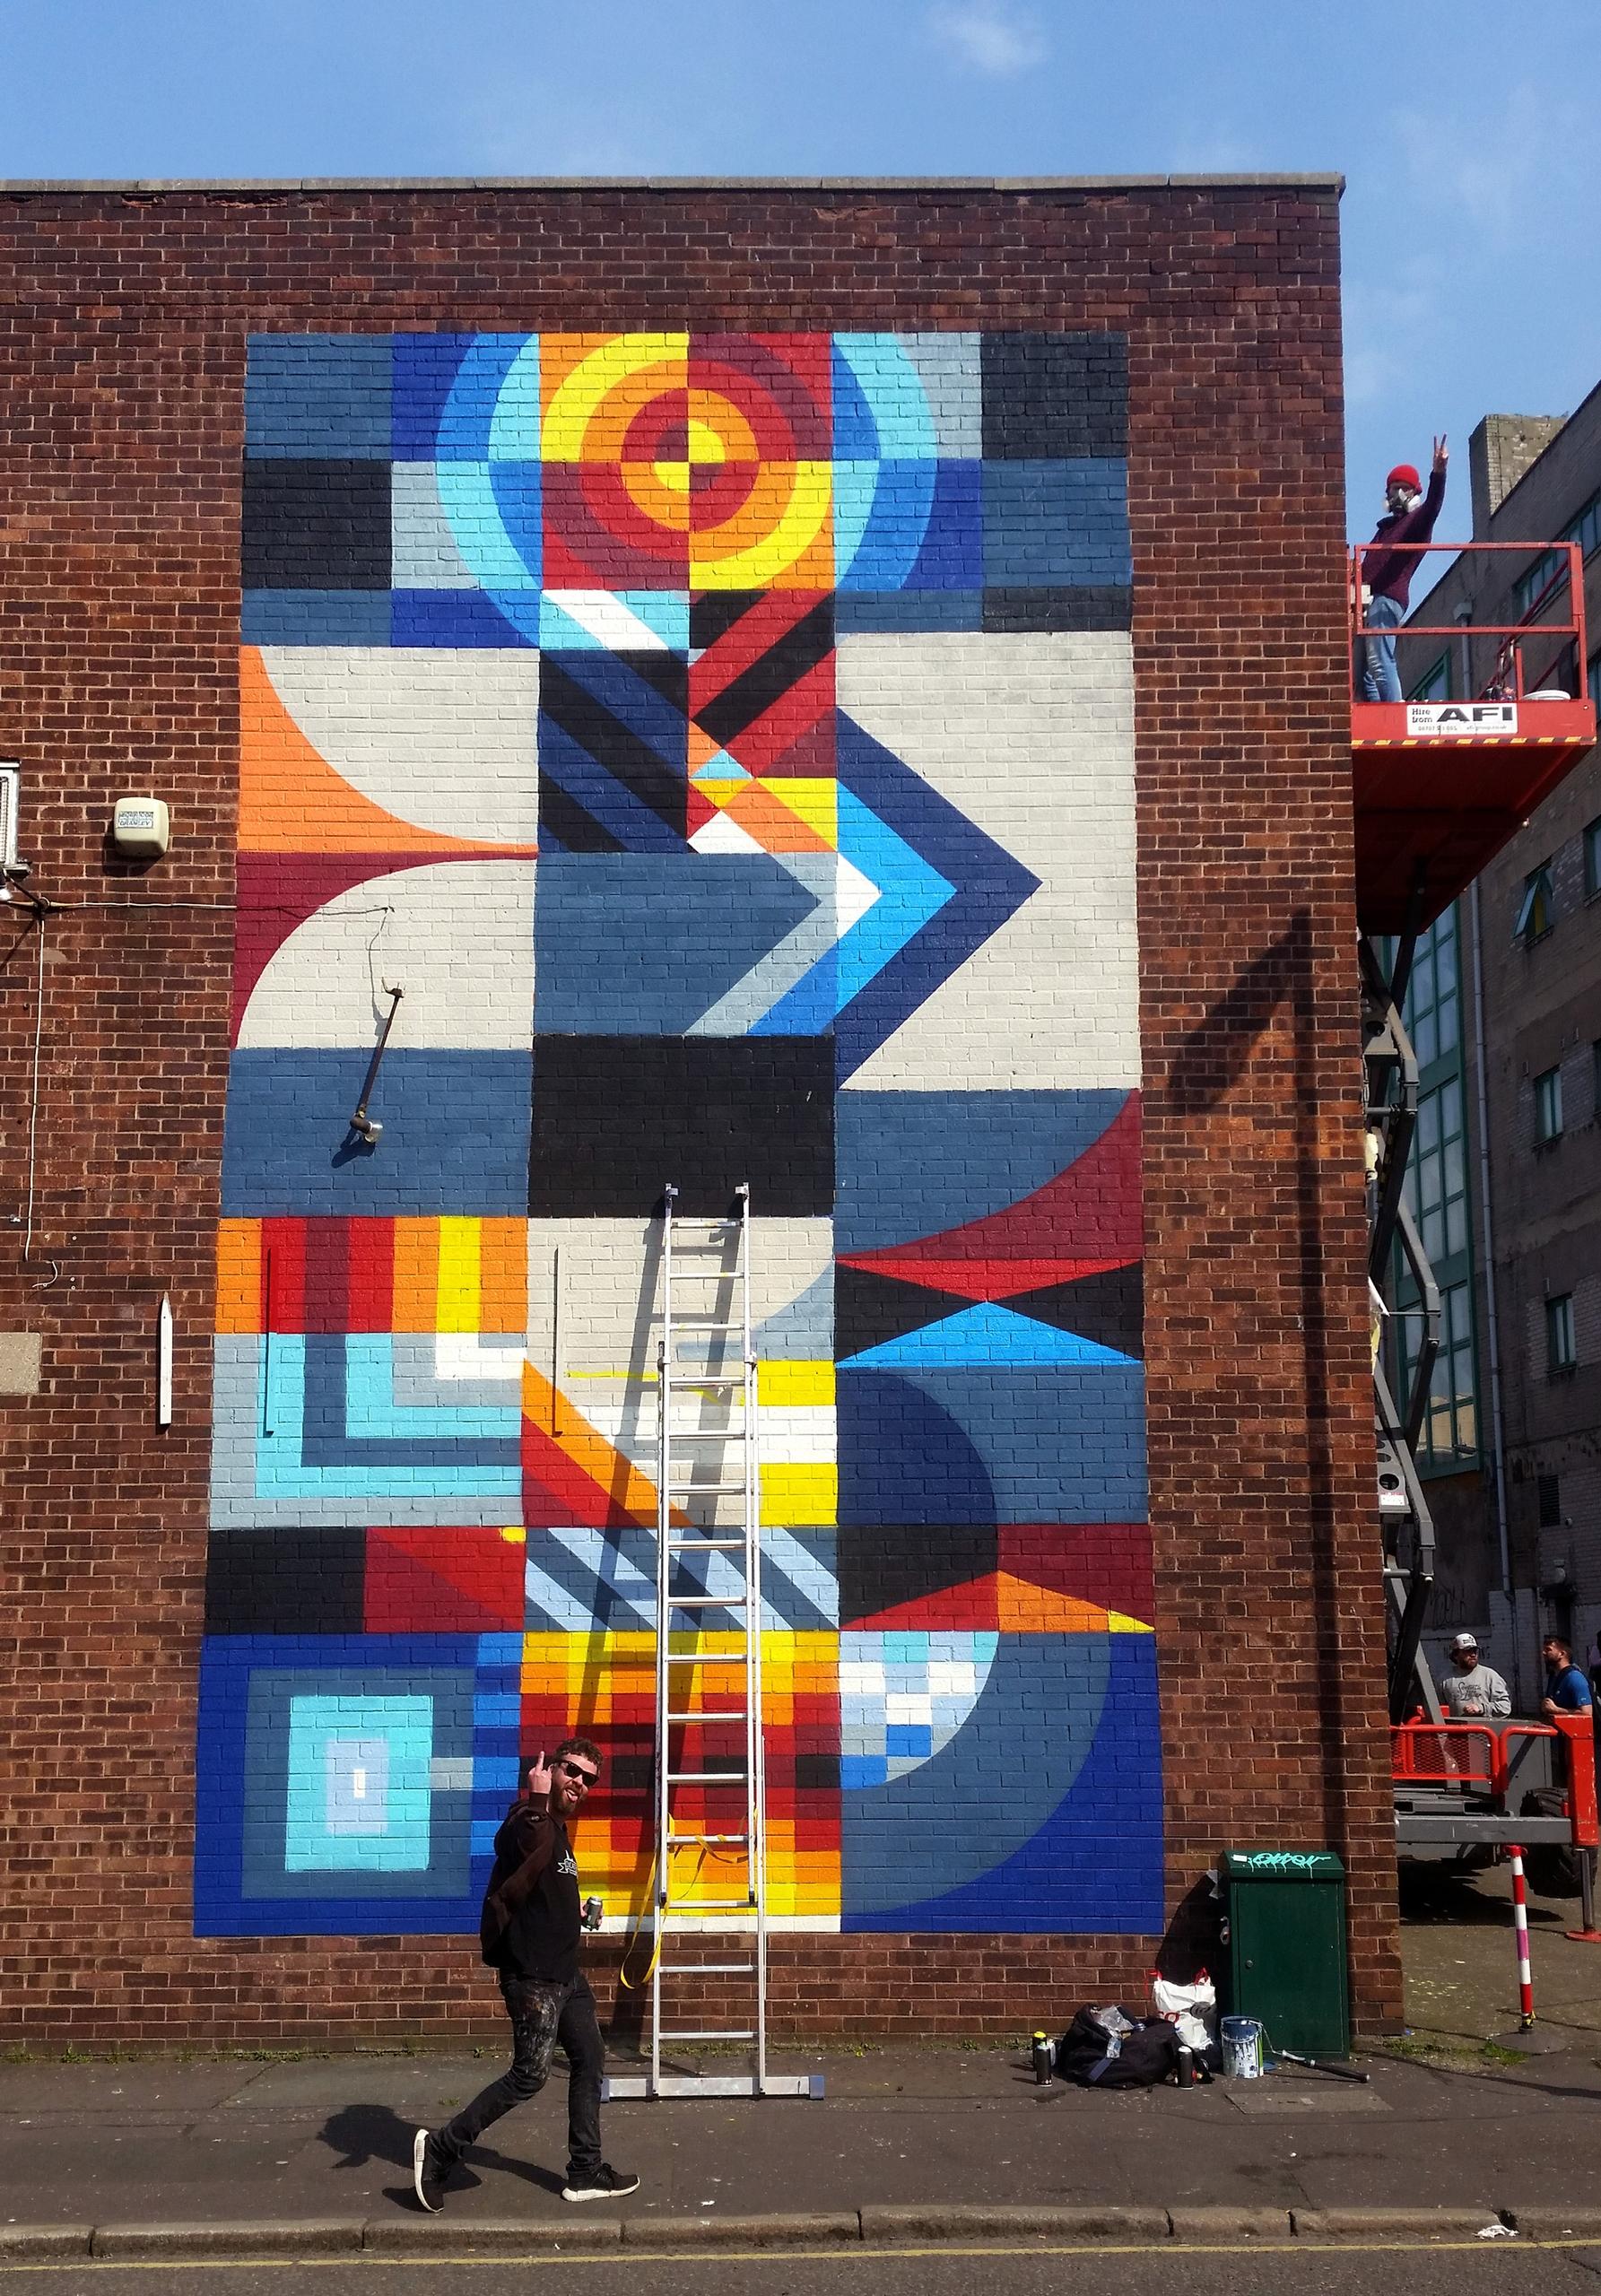 Shot week Contrast mural festiv - shaneomalleyart   ello